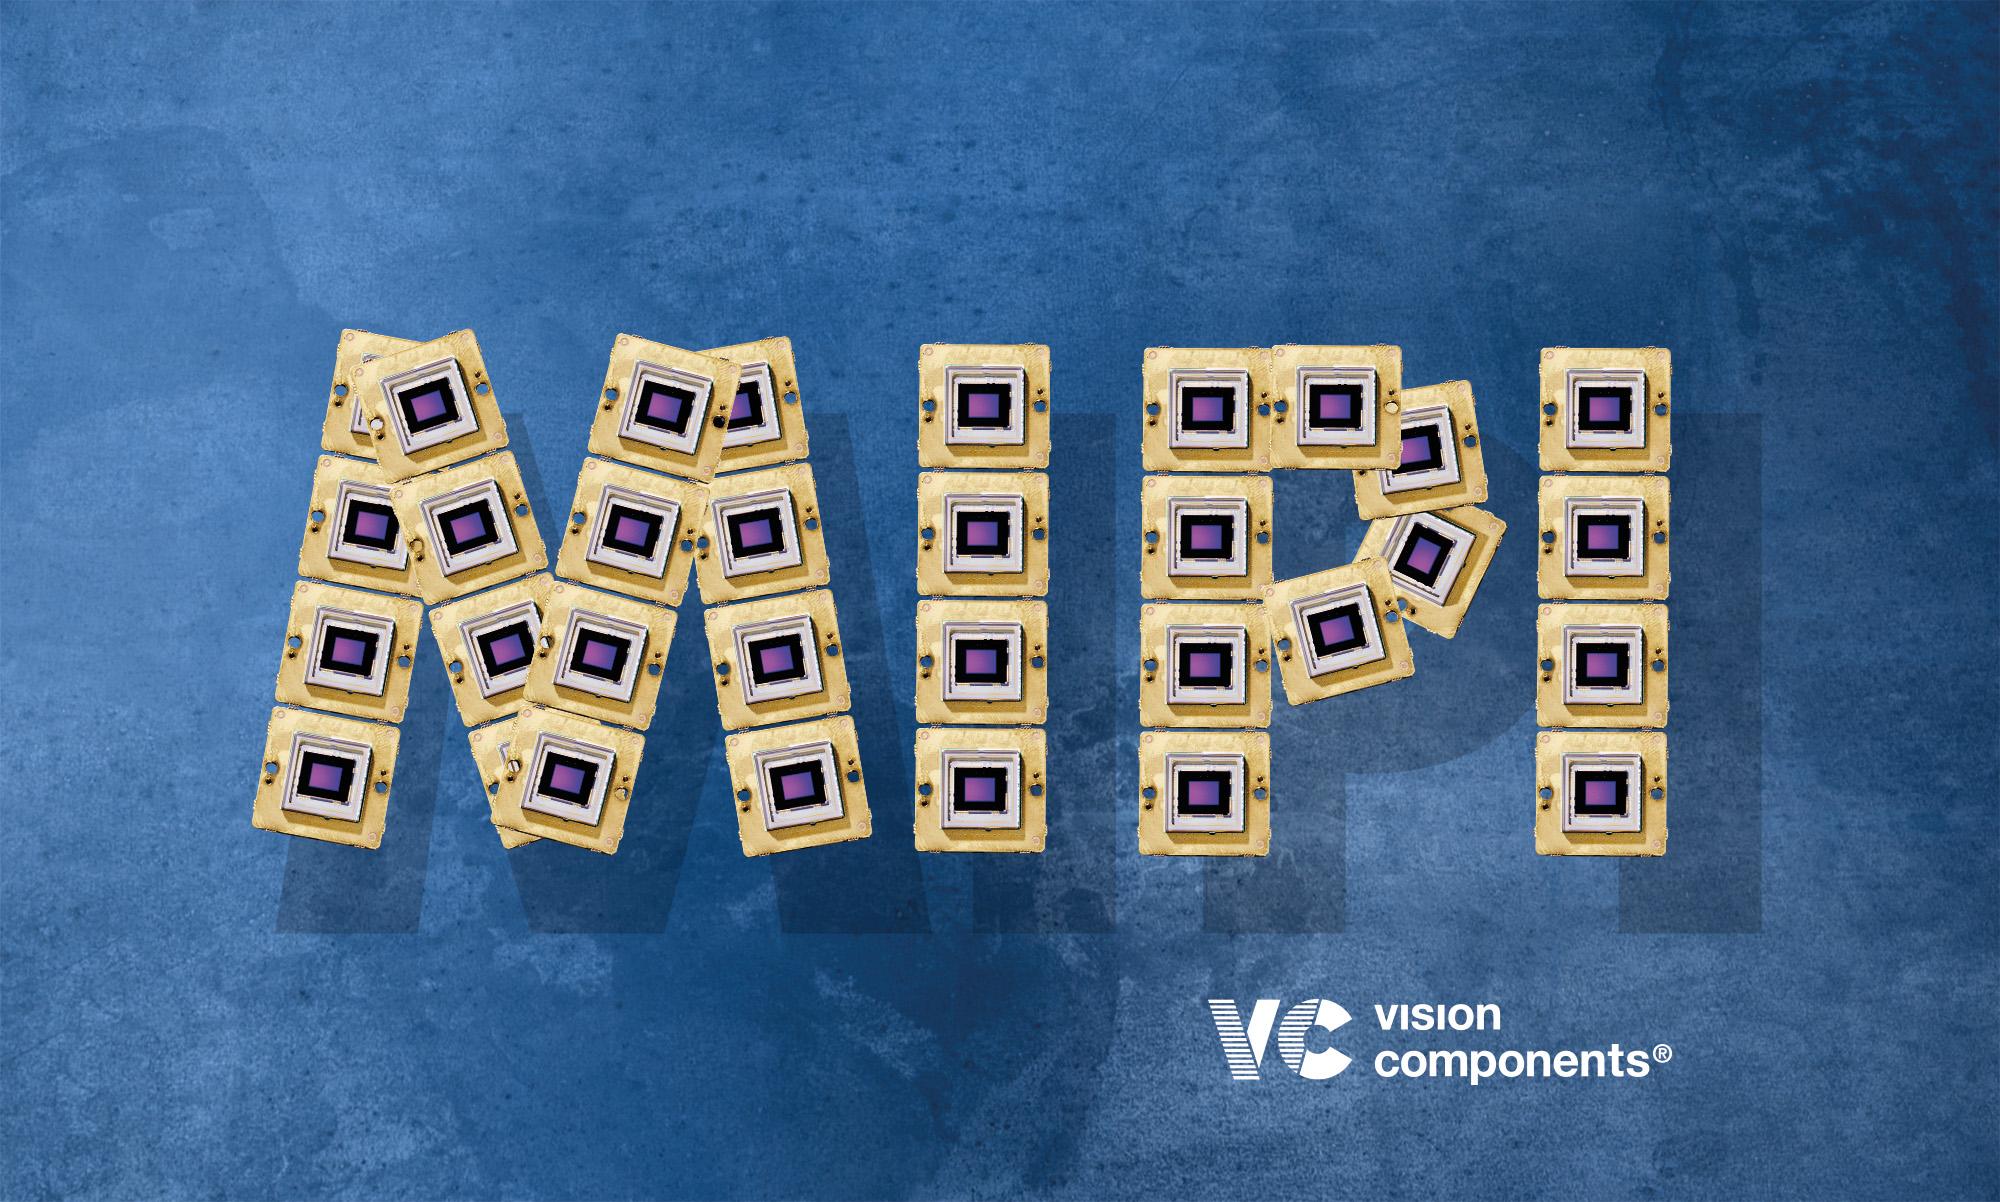 (Bild: Vision Components GmbH)